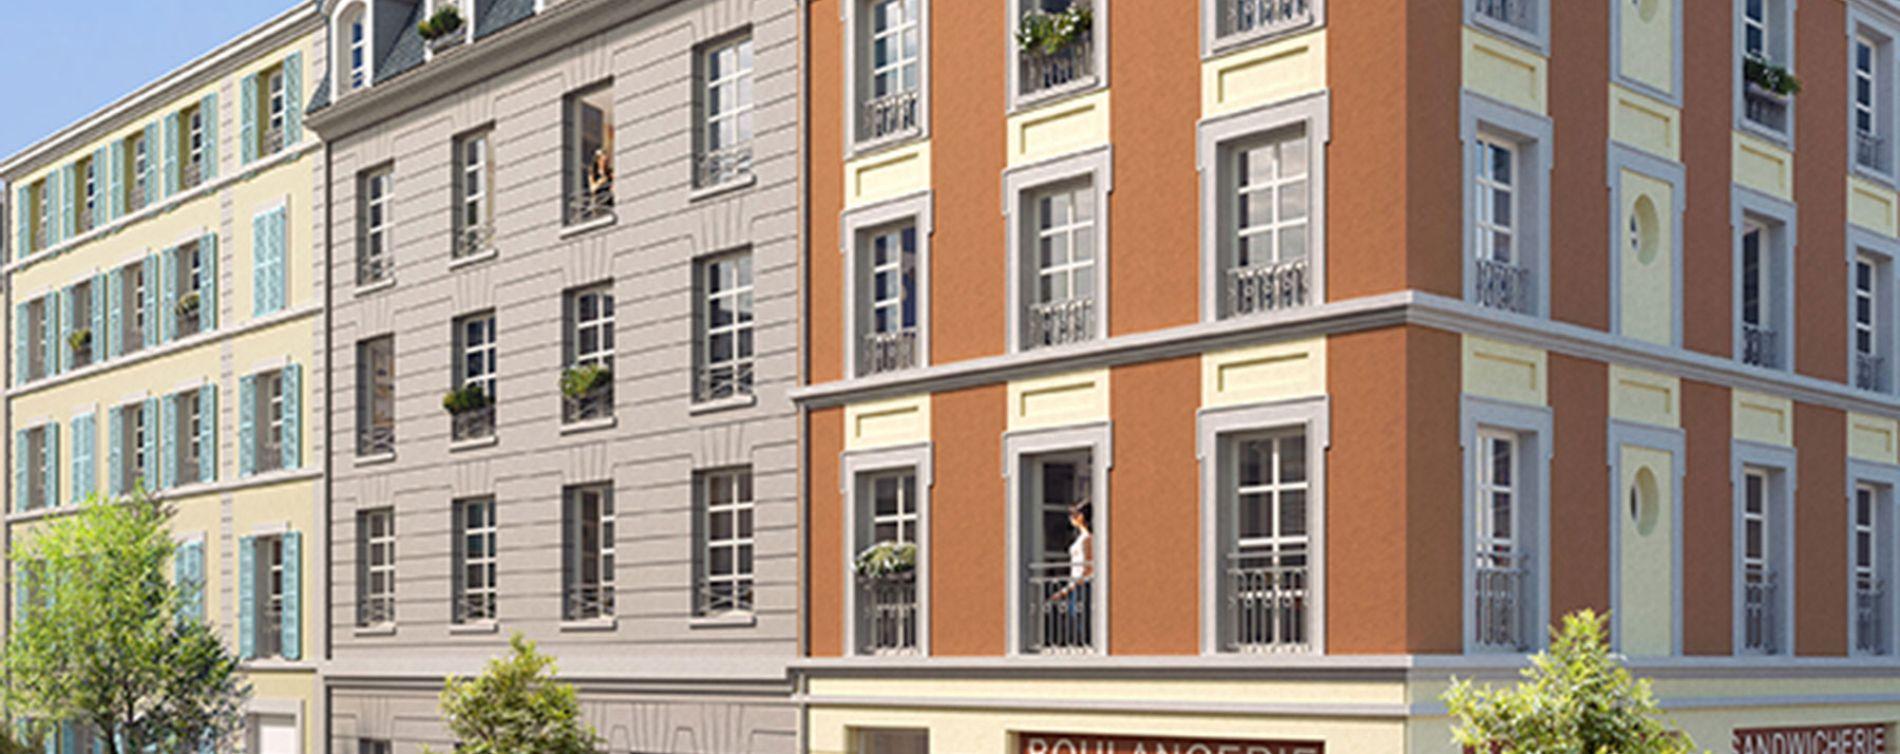 Pontoise : programme immobilier neuve « Campus Pissaro »